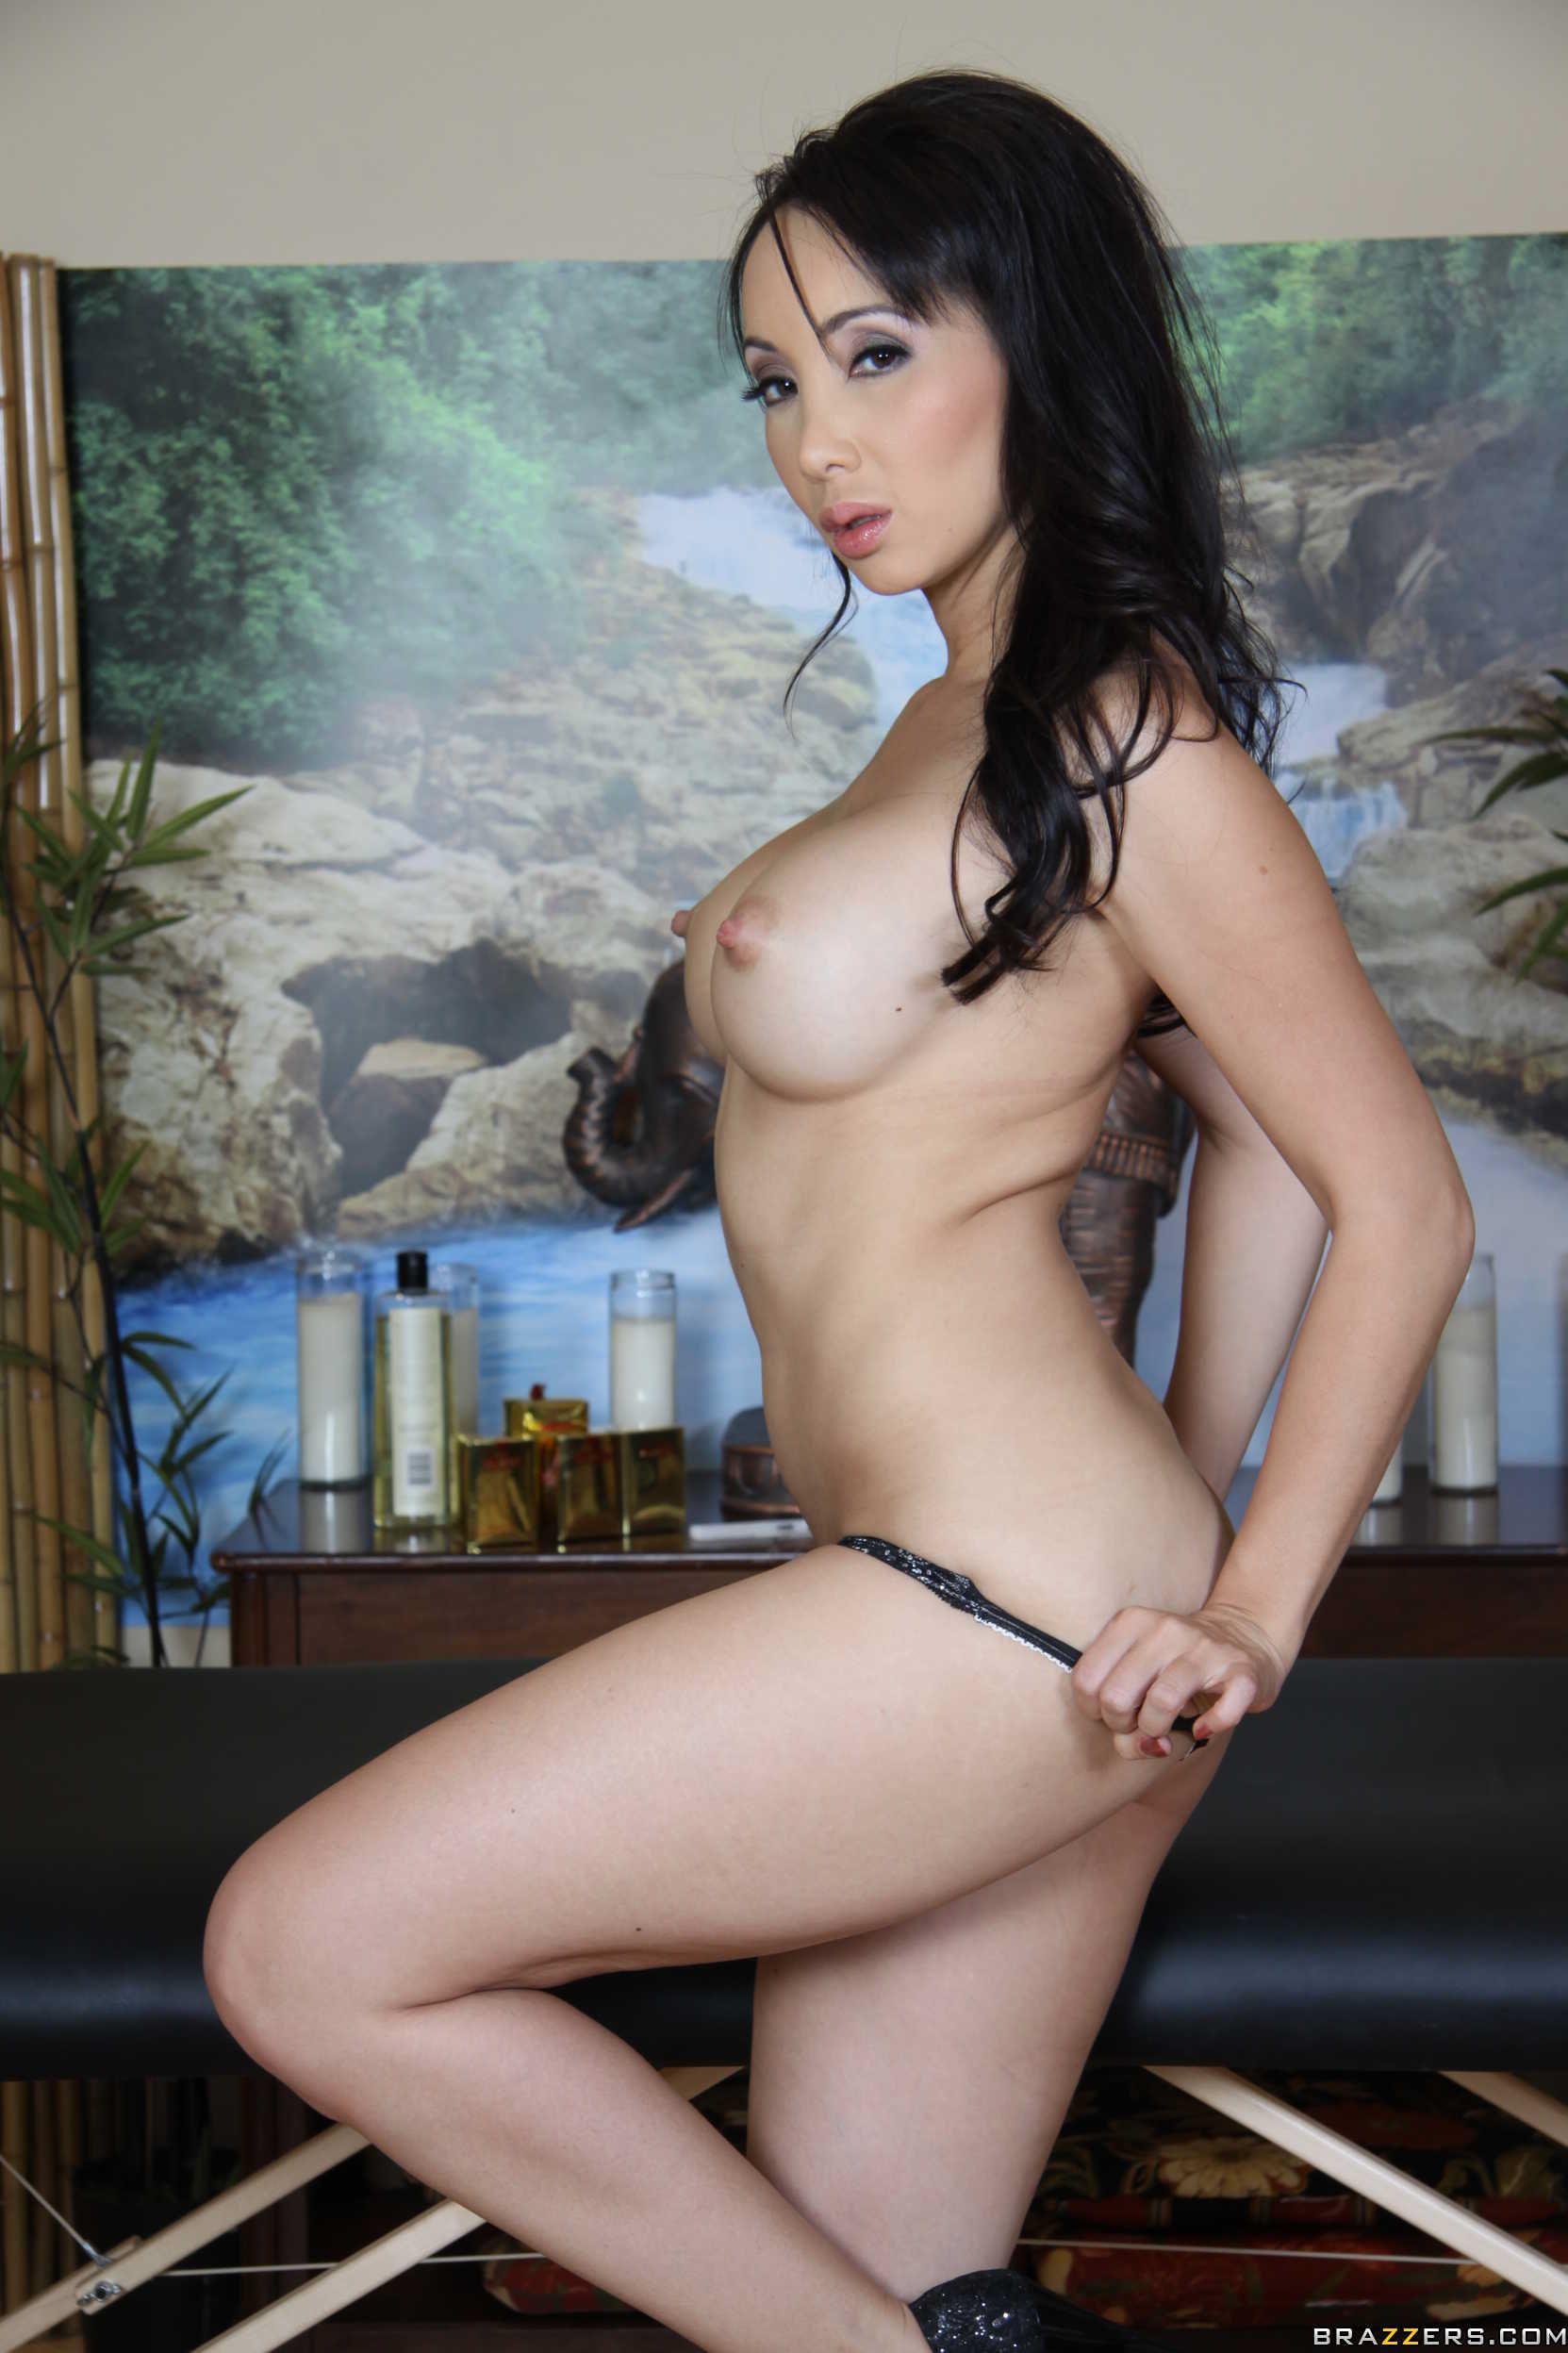 Virgin compression small breasted milf chloe riding a big black toy